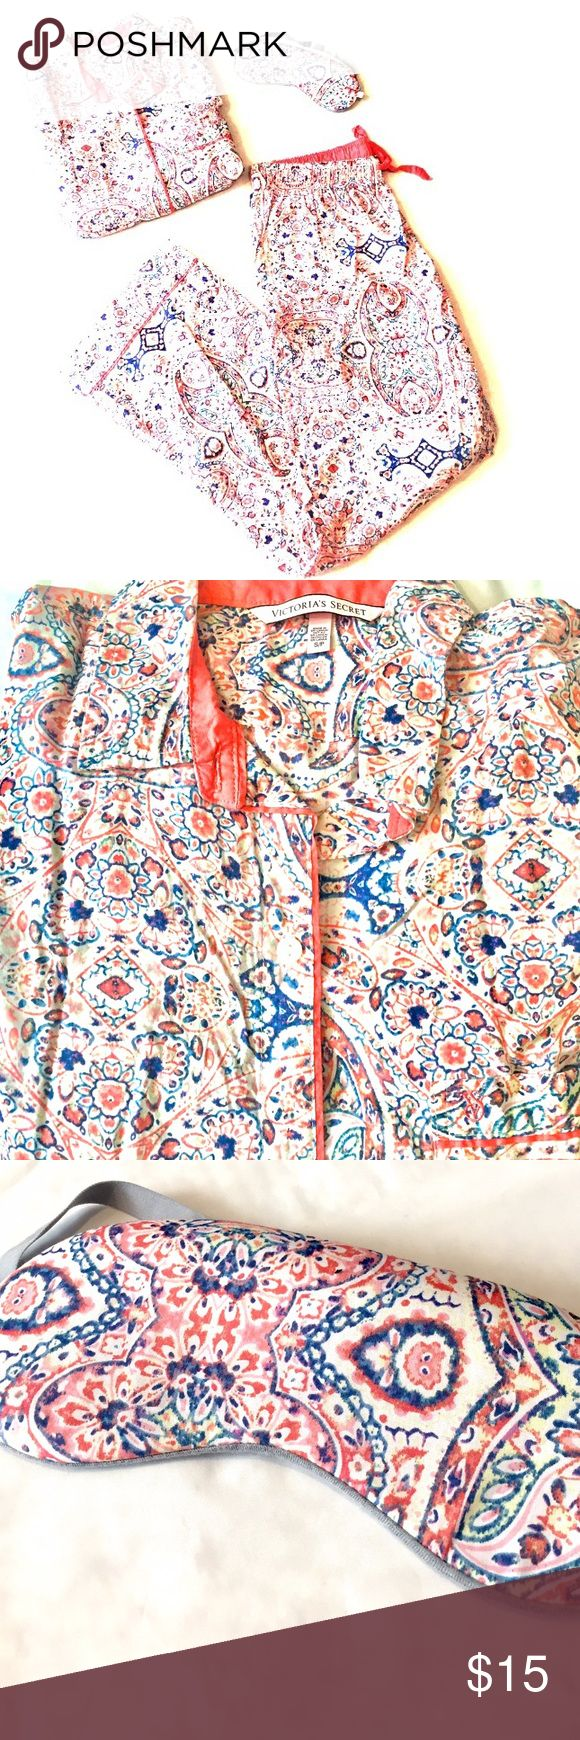 Host Pick❗️🎉 Matching Pajama Set Victoria's Secret Matching Pajama Set •size small •56% cotton, 44% modal •comes with eye mask •multiple colors  Cozy & comfy🤗 Victoria's Secret Intimates & Sleepwear Pajamas